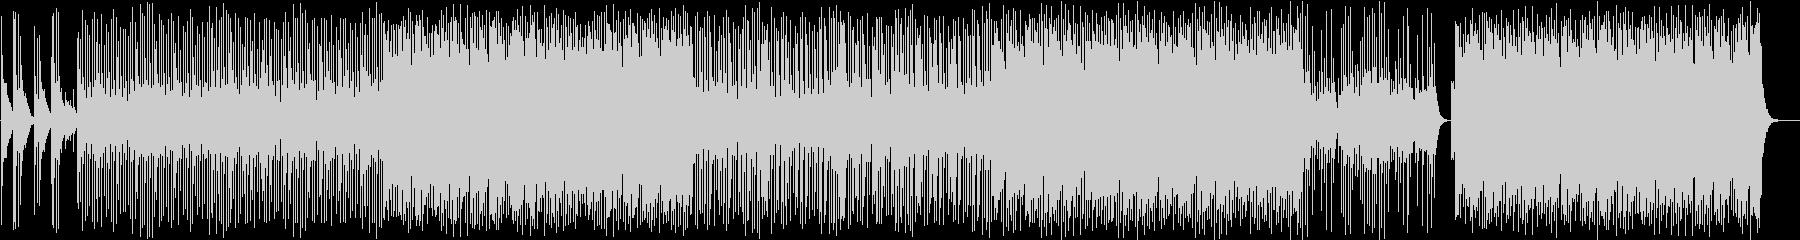 和風/和楽器(三味線・琴・太鼓)/B6の未再生の波形